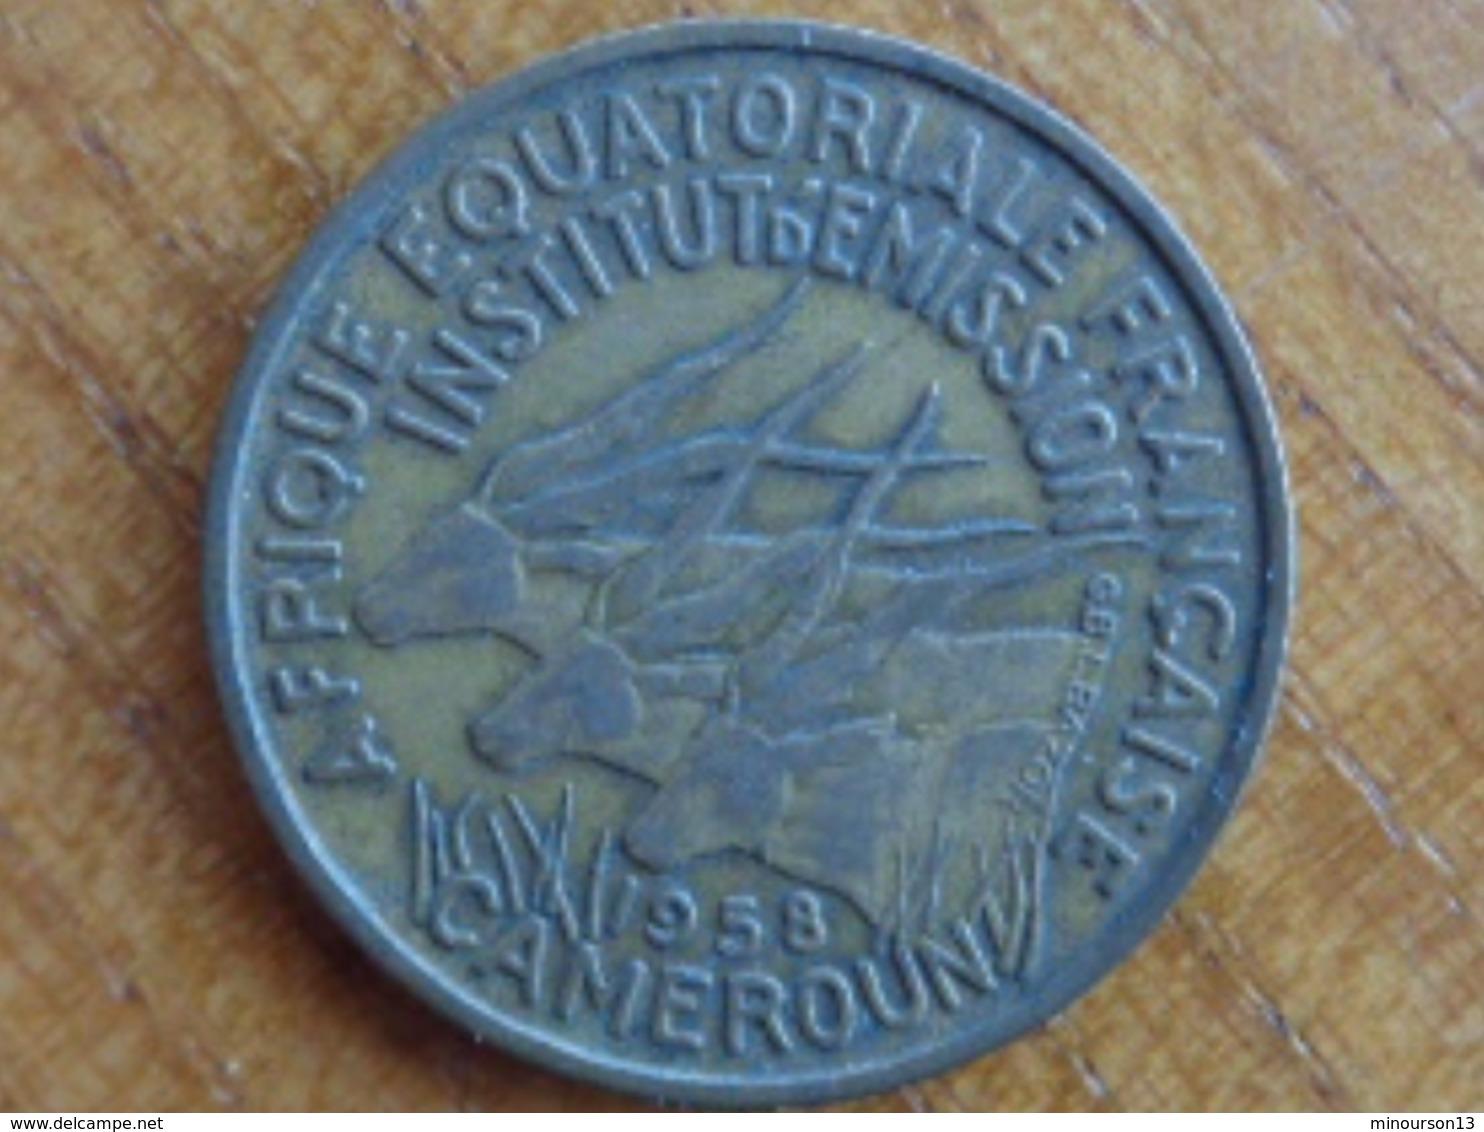 A.E.F CAMEROUN : 25 FRANCS 1958 - Cameroun